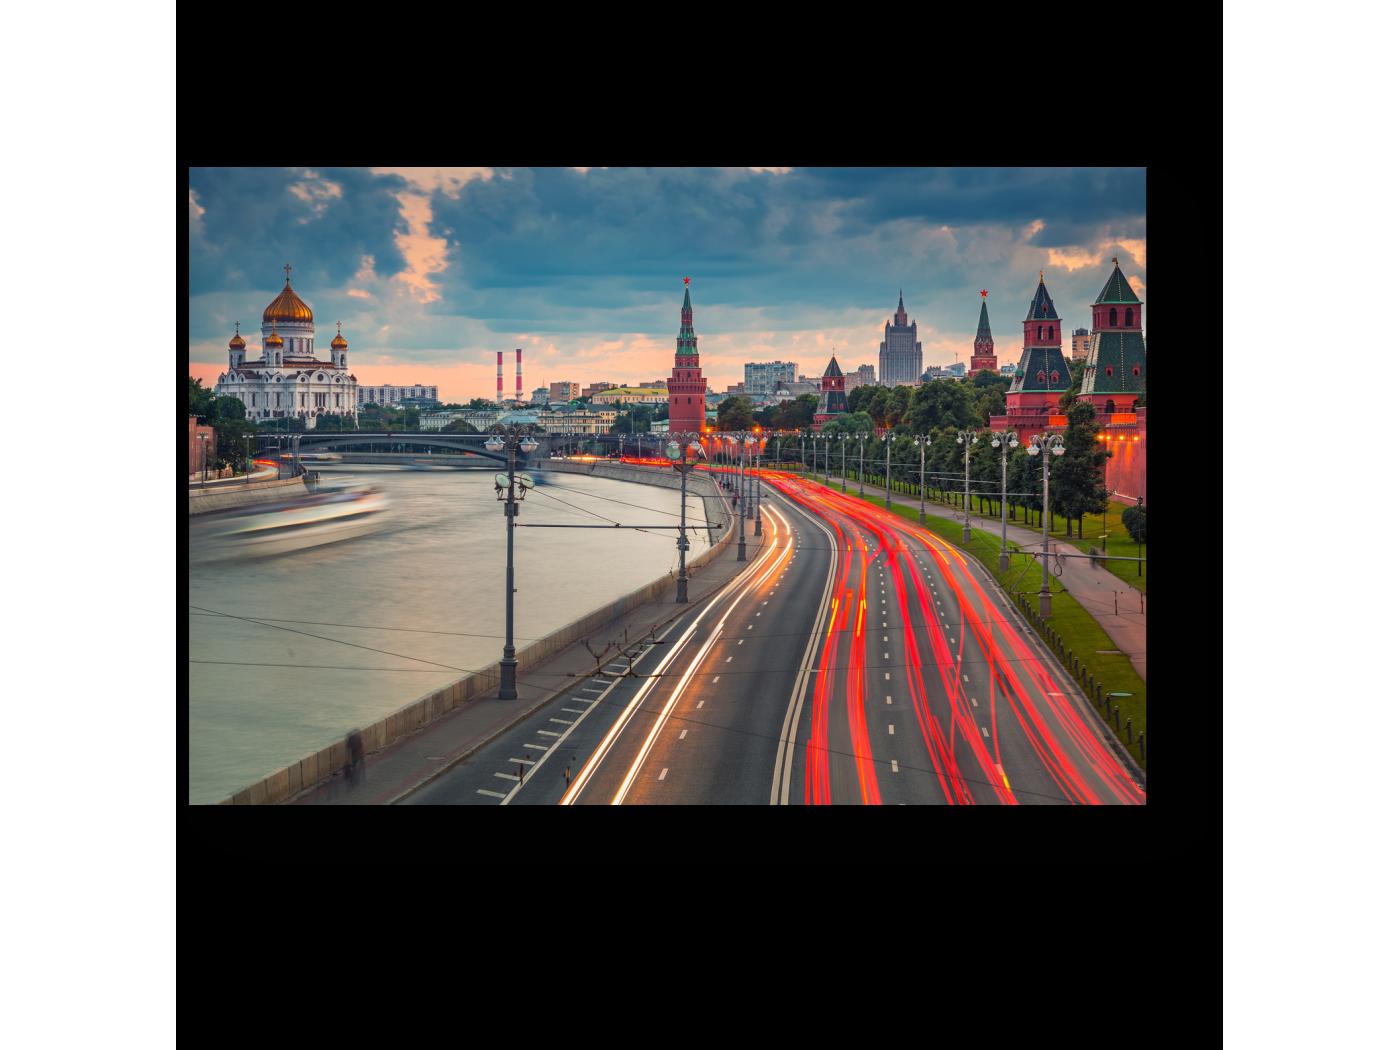 Модульная картина У стен Кремля (30x20) фото